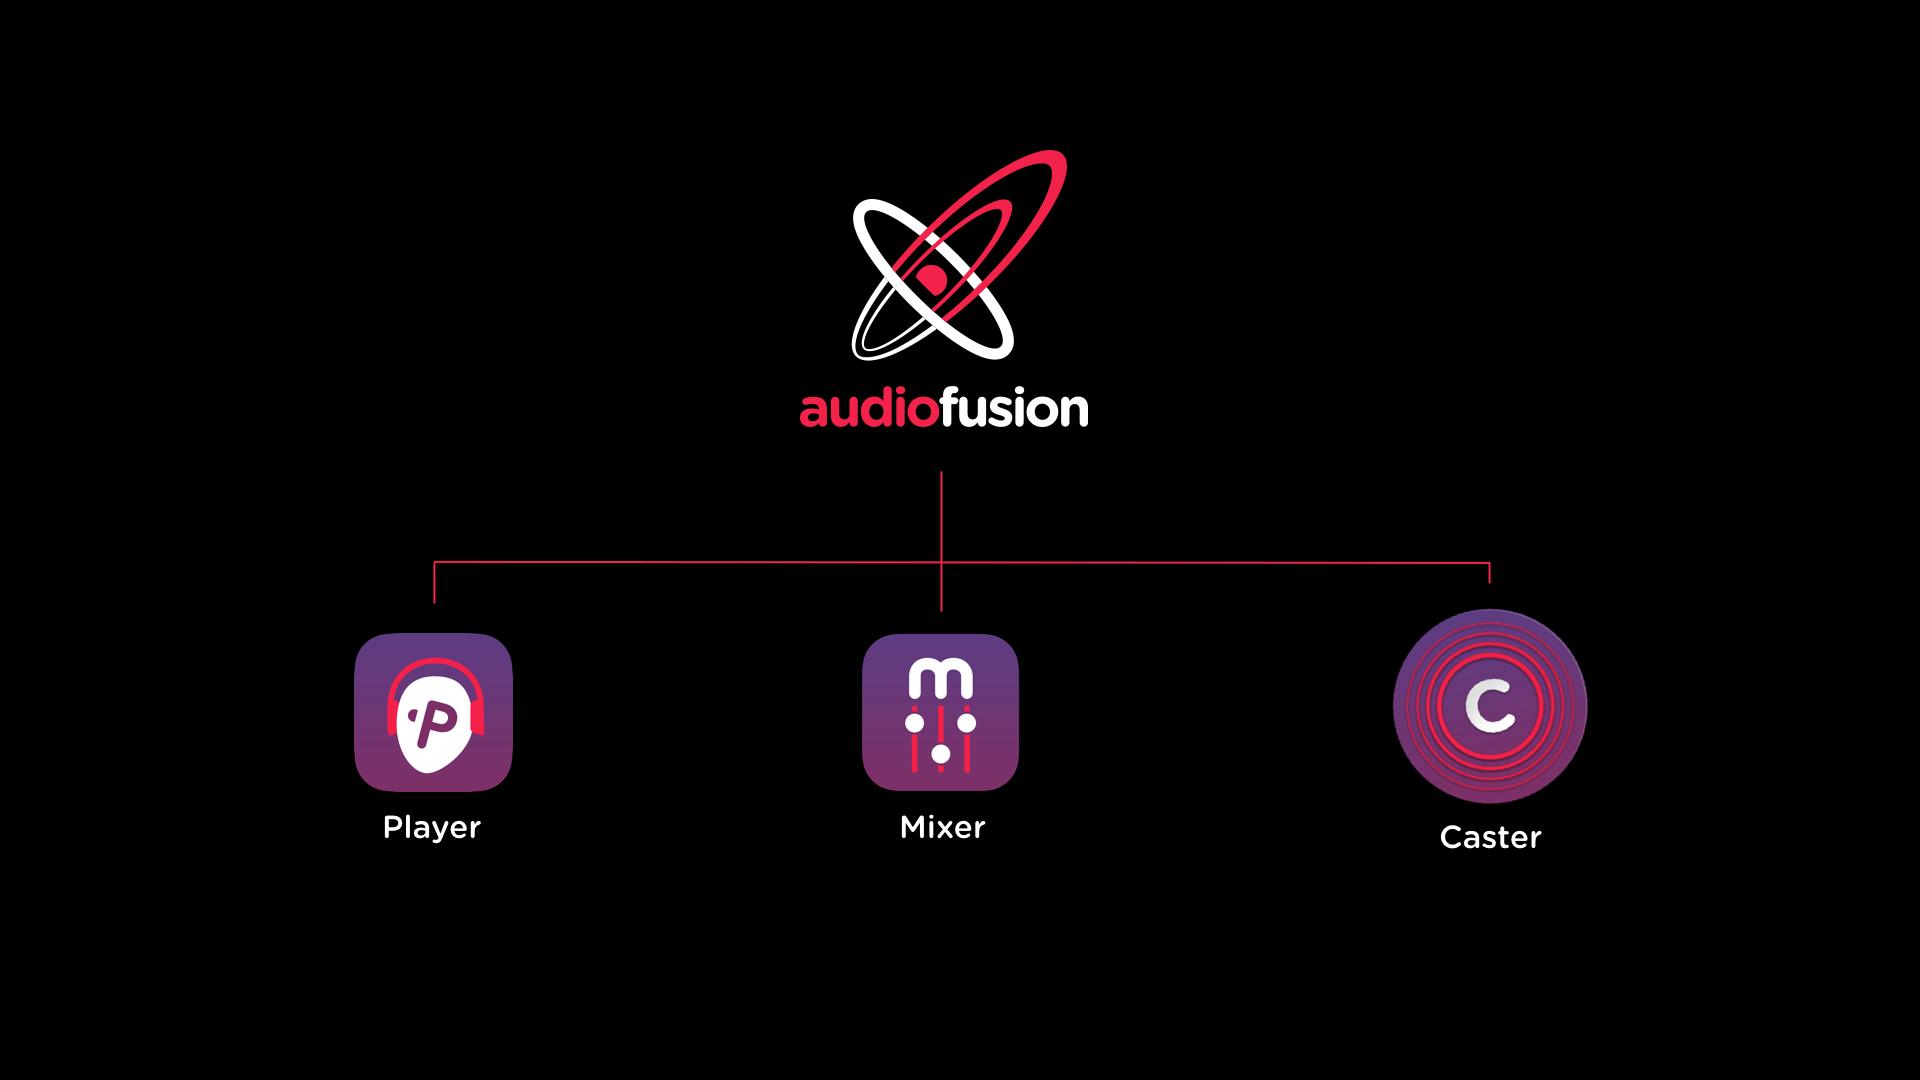 audioFusion_branding_portfolio_.011.png